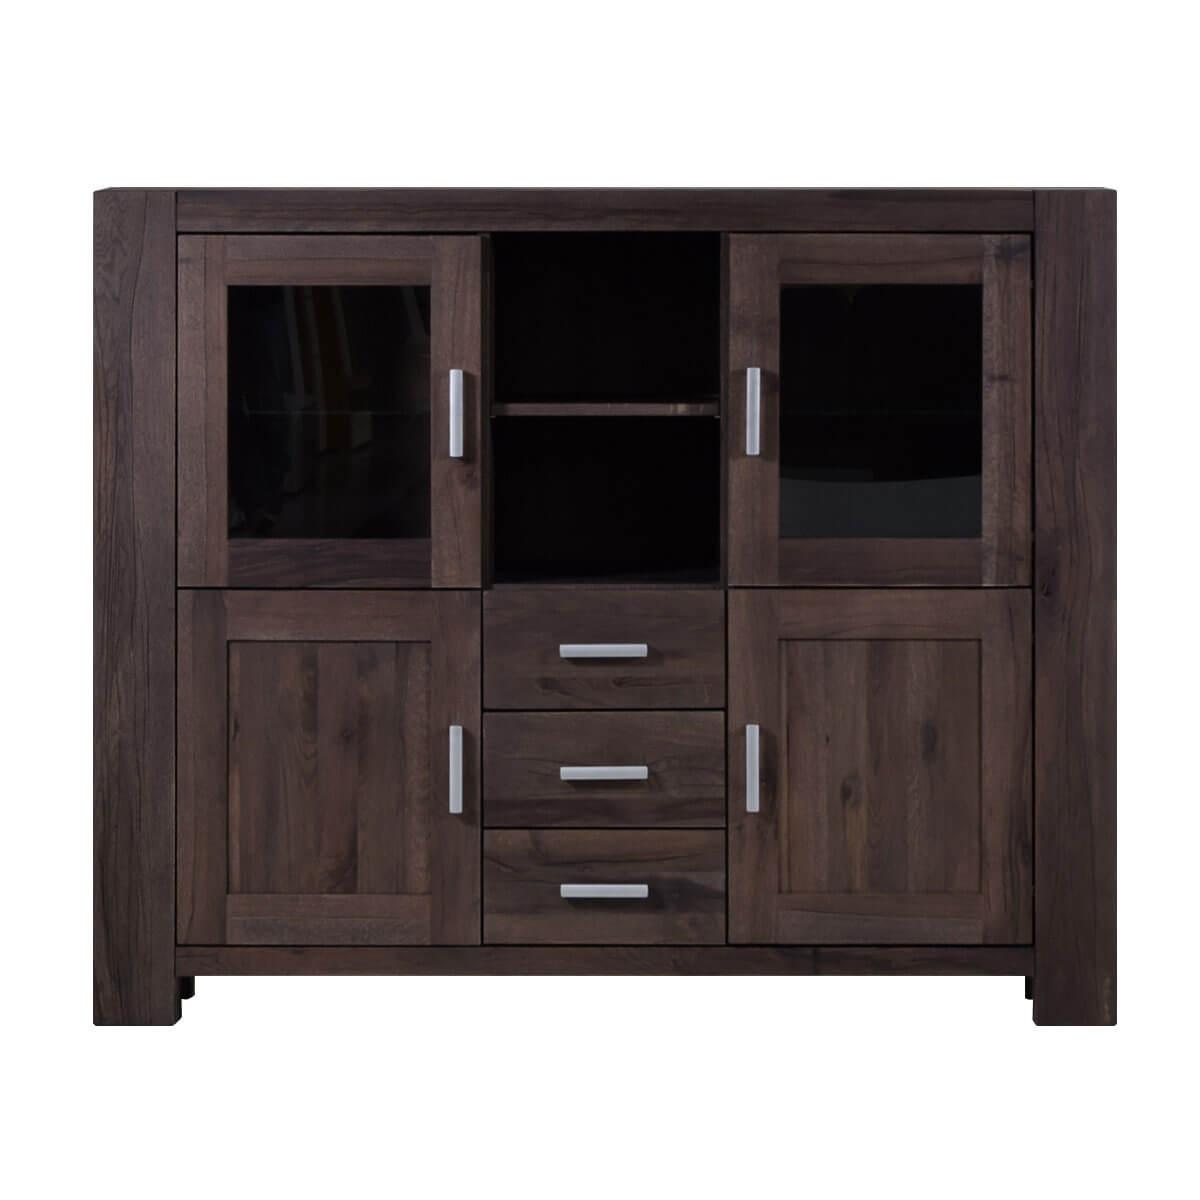 highboard braxton in eiche massiv verwittert antik. Black Bedroom Furniture Sets. Home Design Ideas